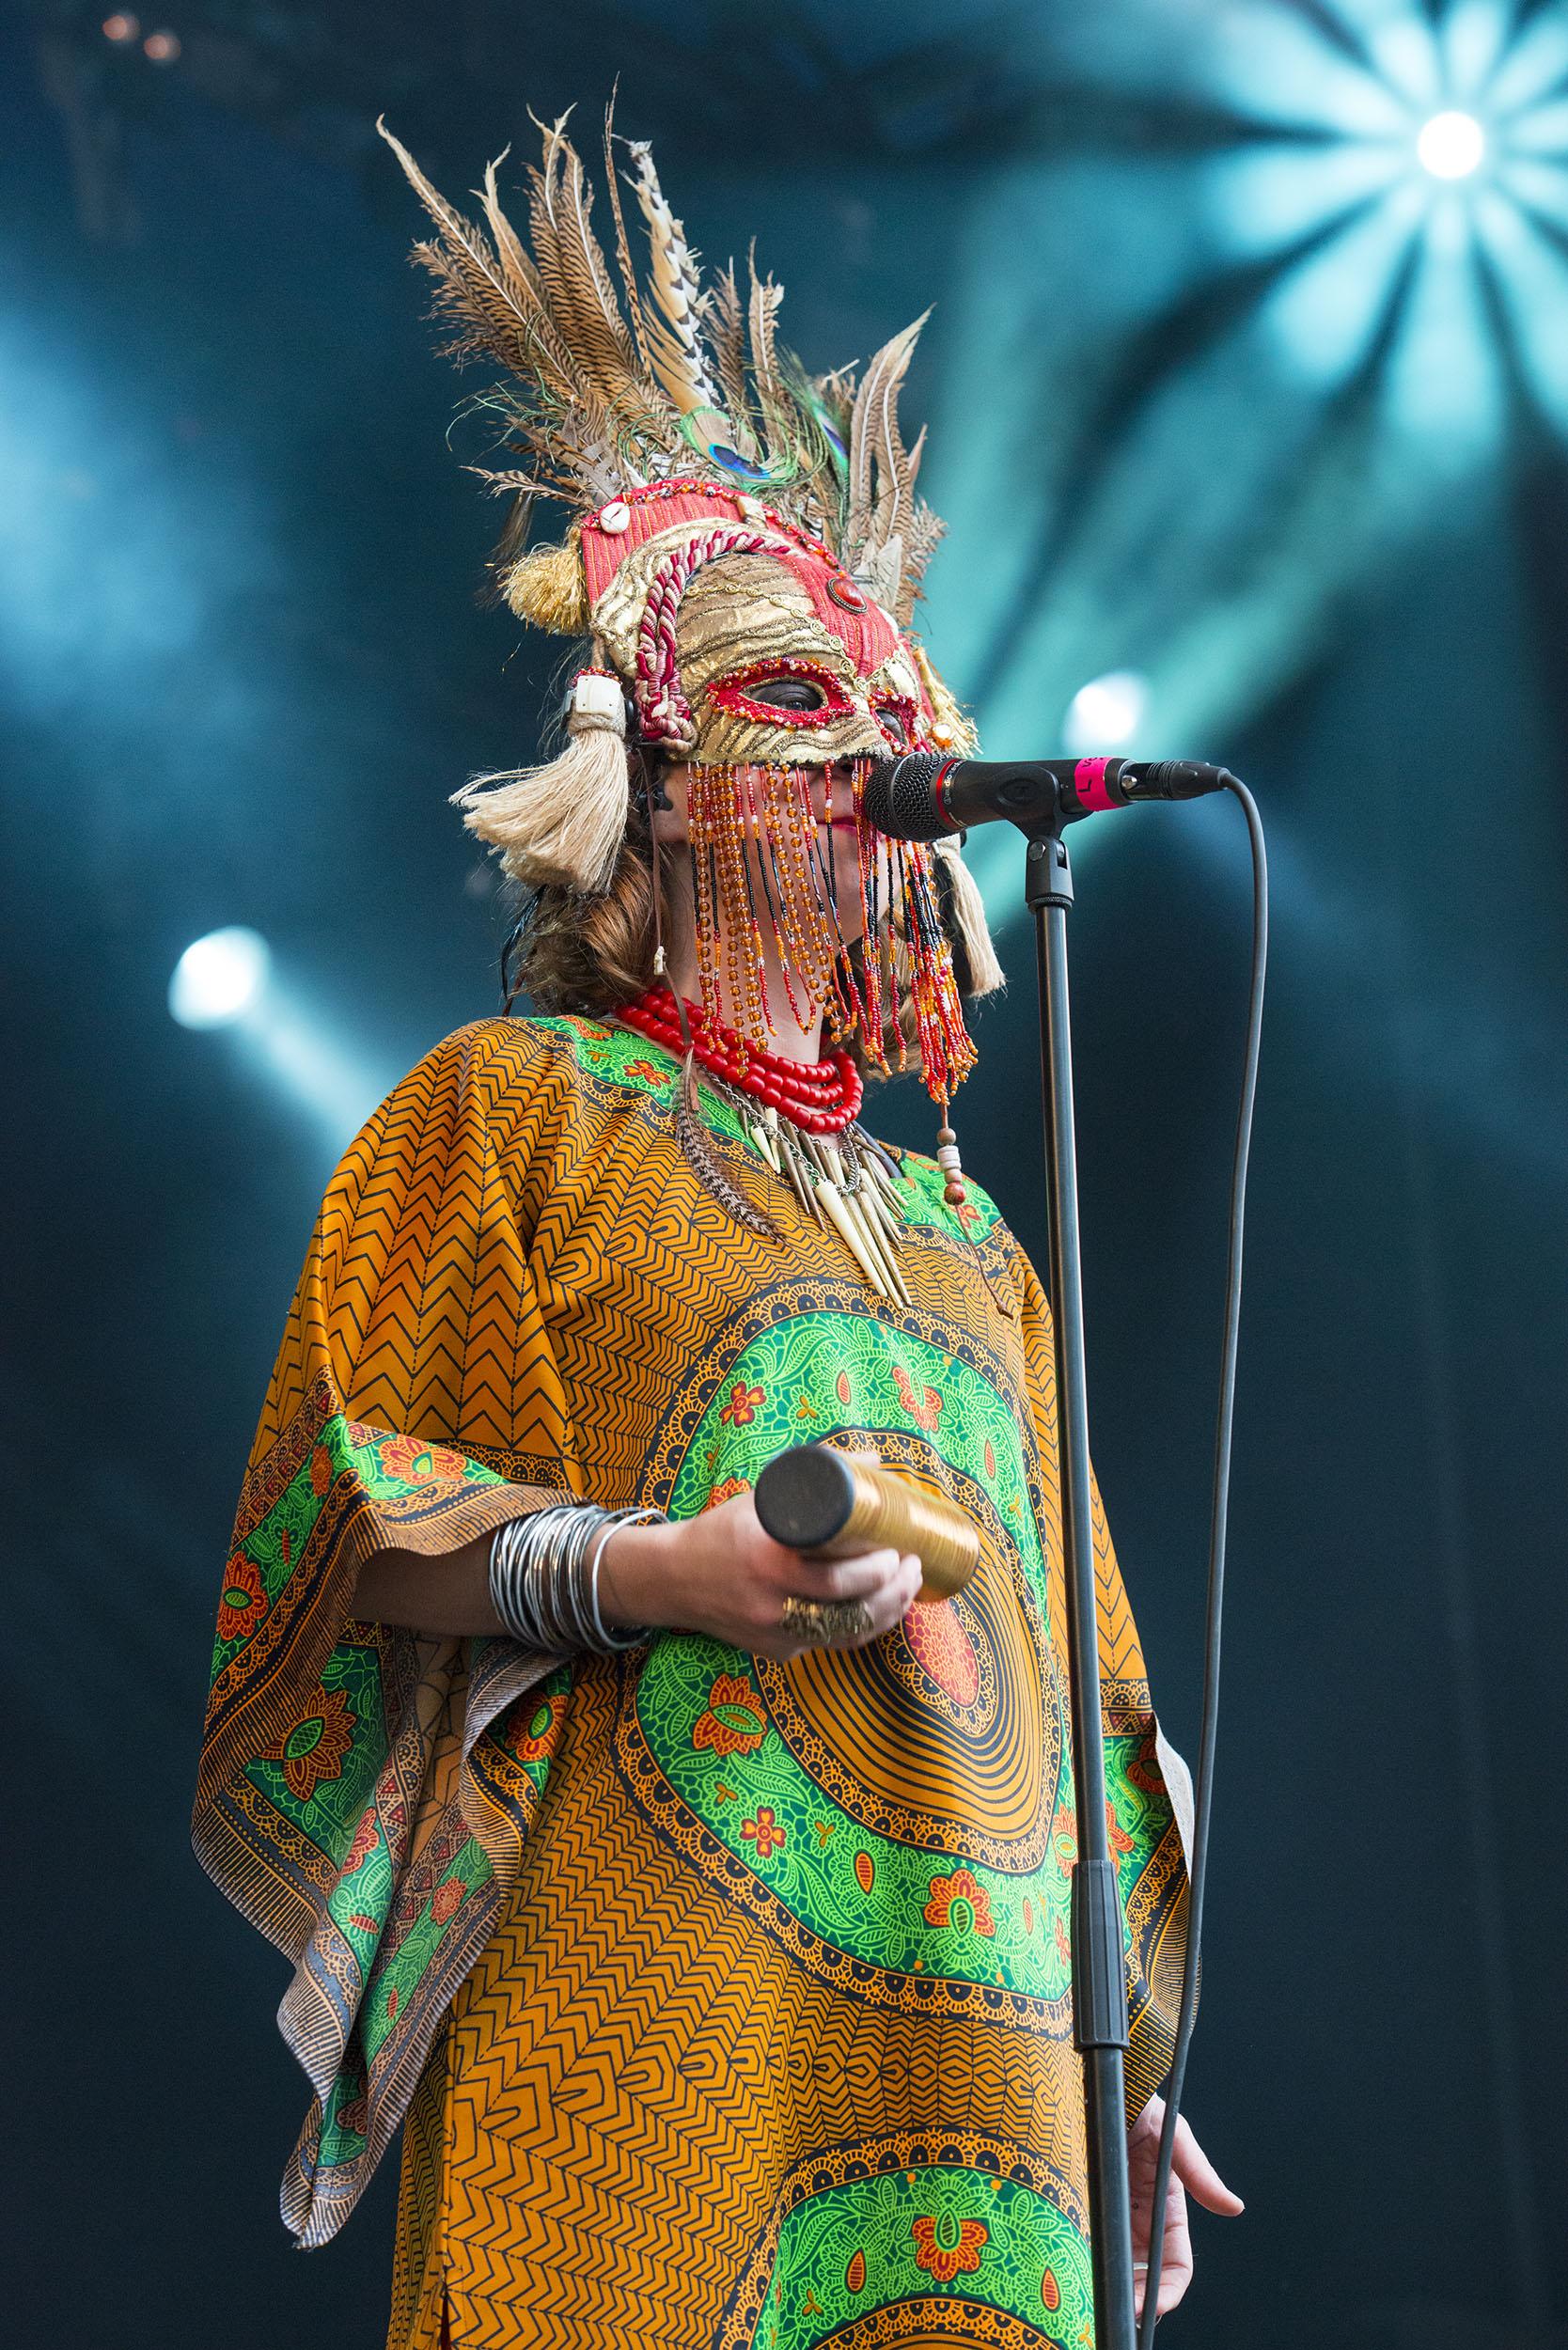 Goat @ Cactusfestival 2016 (© Nick De Baerdemaeker)